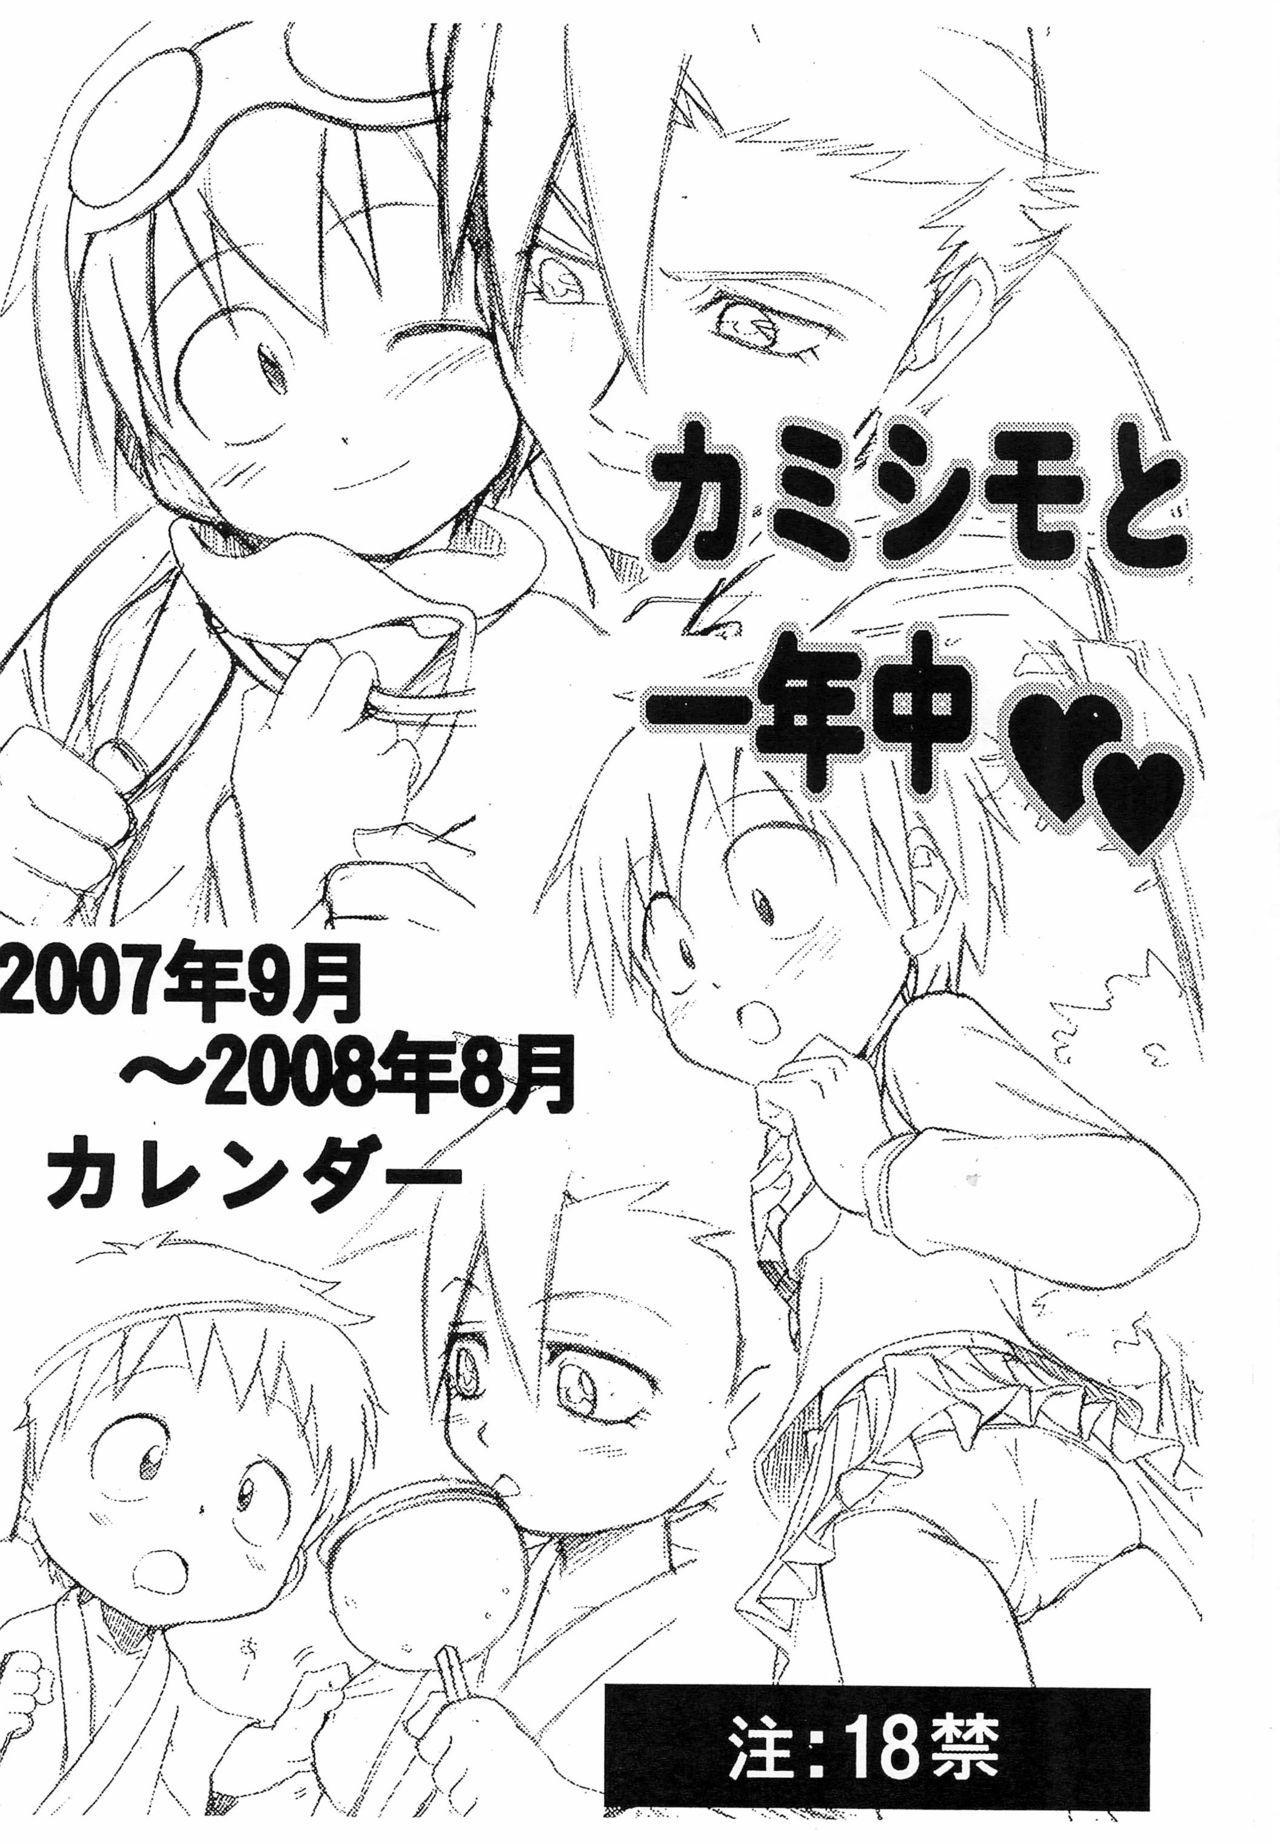 (C72) [Shamon Tei (Shamon)] KamiShimo to Ichinenjuu 2007-nen 9-gatsu - 2008-nen 8-gatsu Calendar (Gurren Lagann) 0